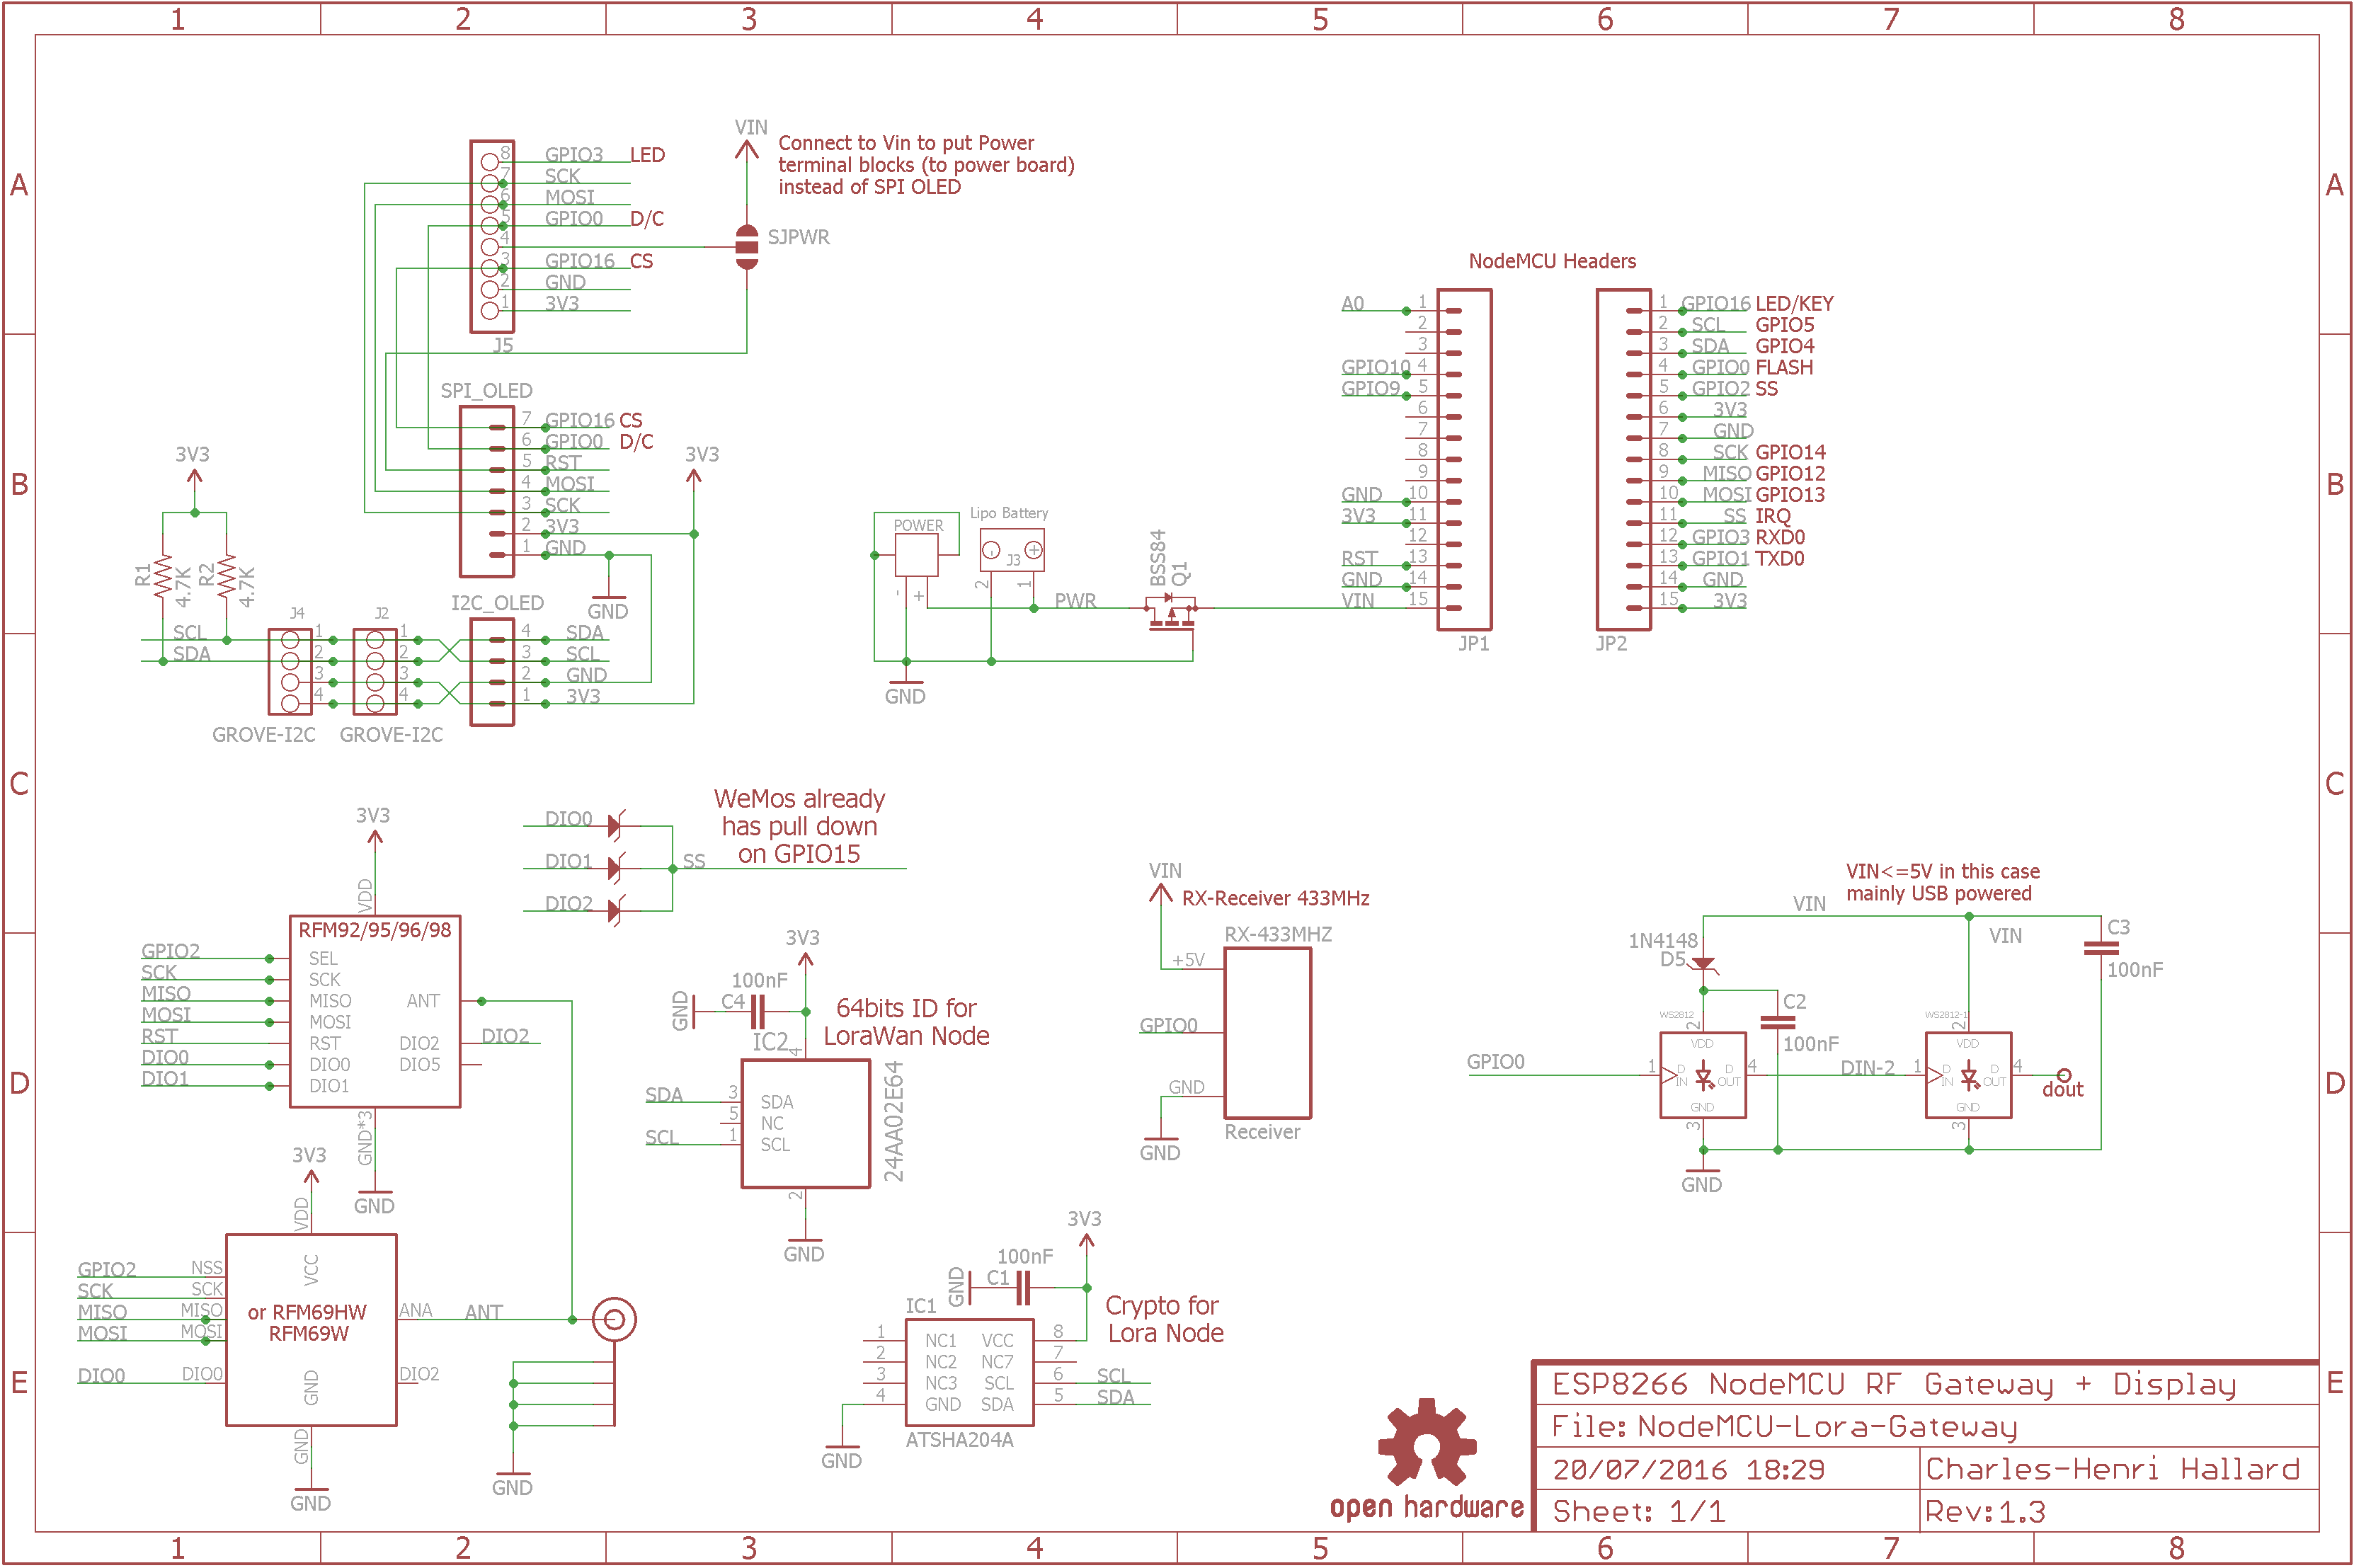 GitHub - hallard/NodeMCU-Gateway: NodeMCU ESP8266 RF Gateway and